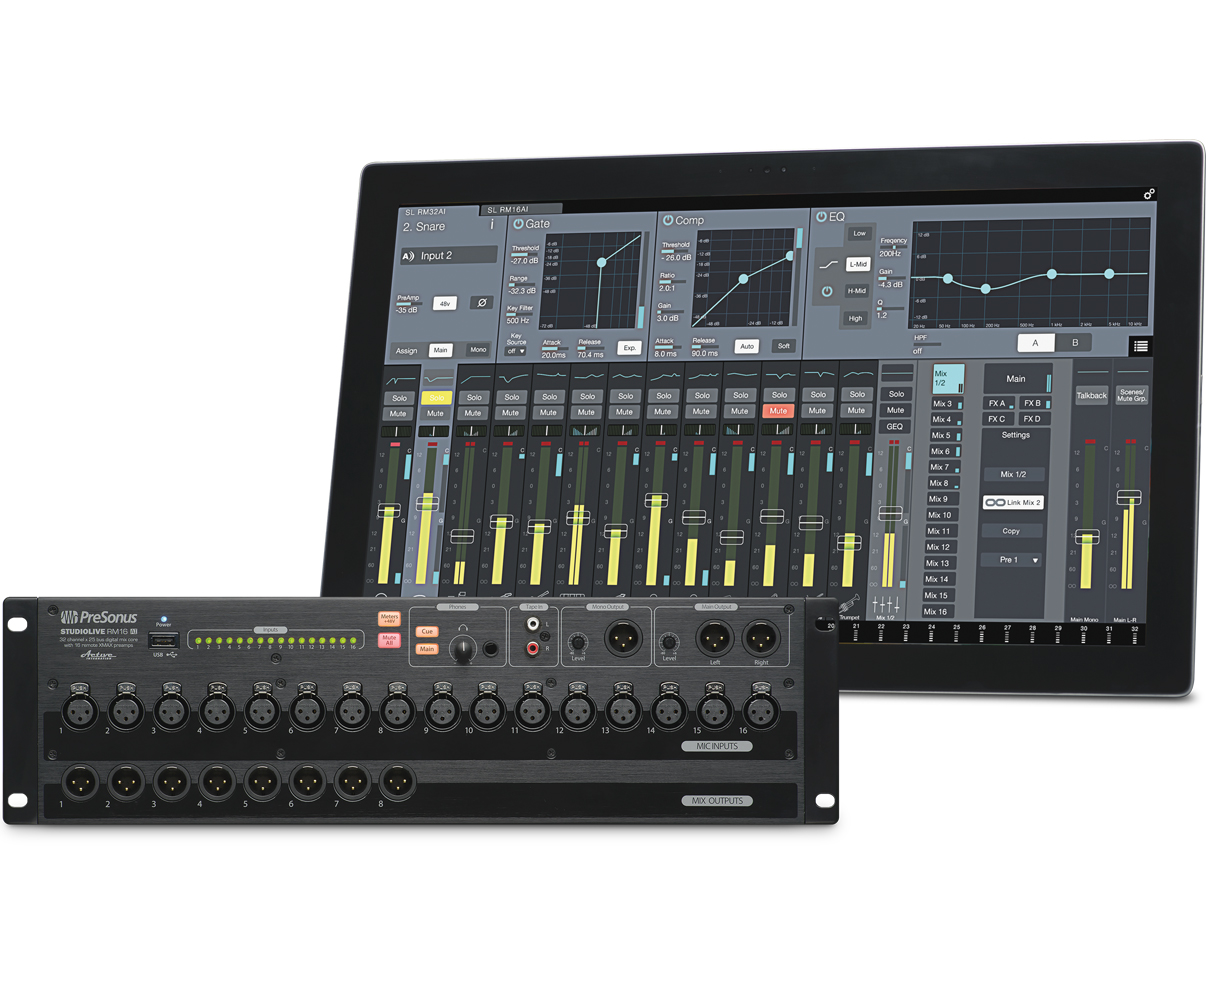 presonus studiolive rm16ai rack mount digital mixer proaudiostar ebay. Black Bedroom Furniture Sets. Home Design Ideas